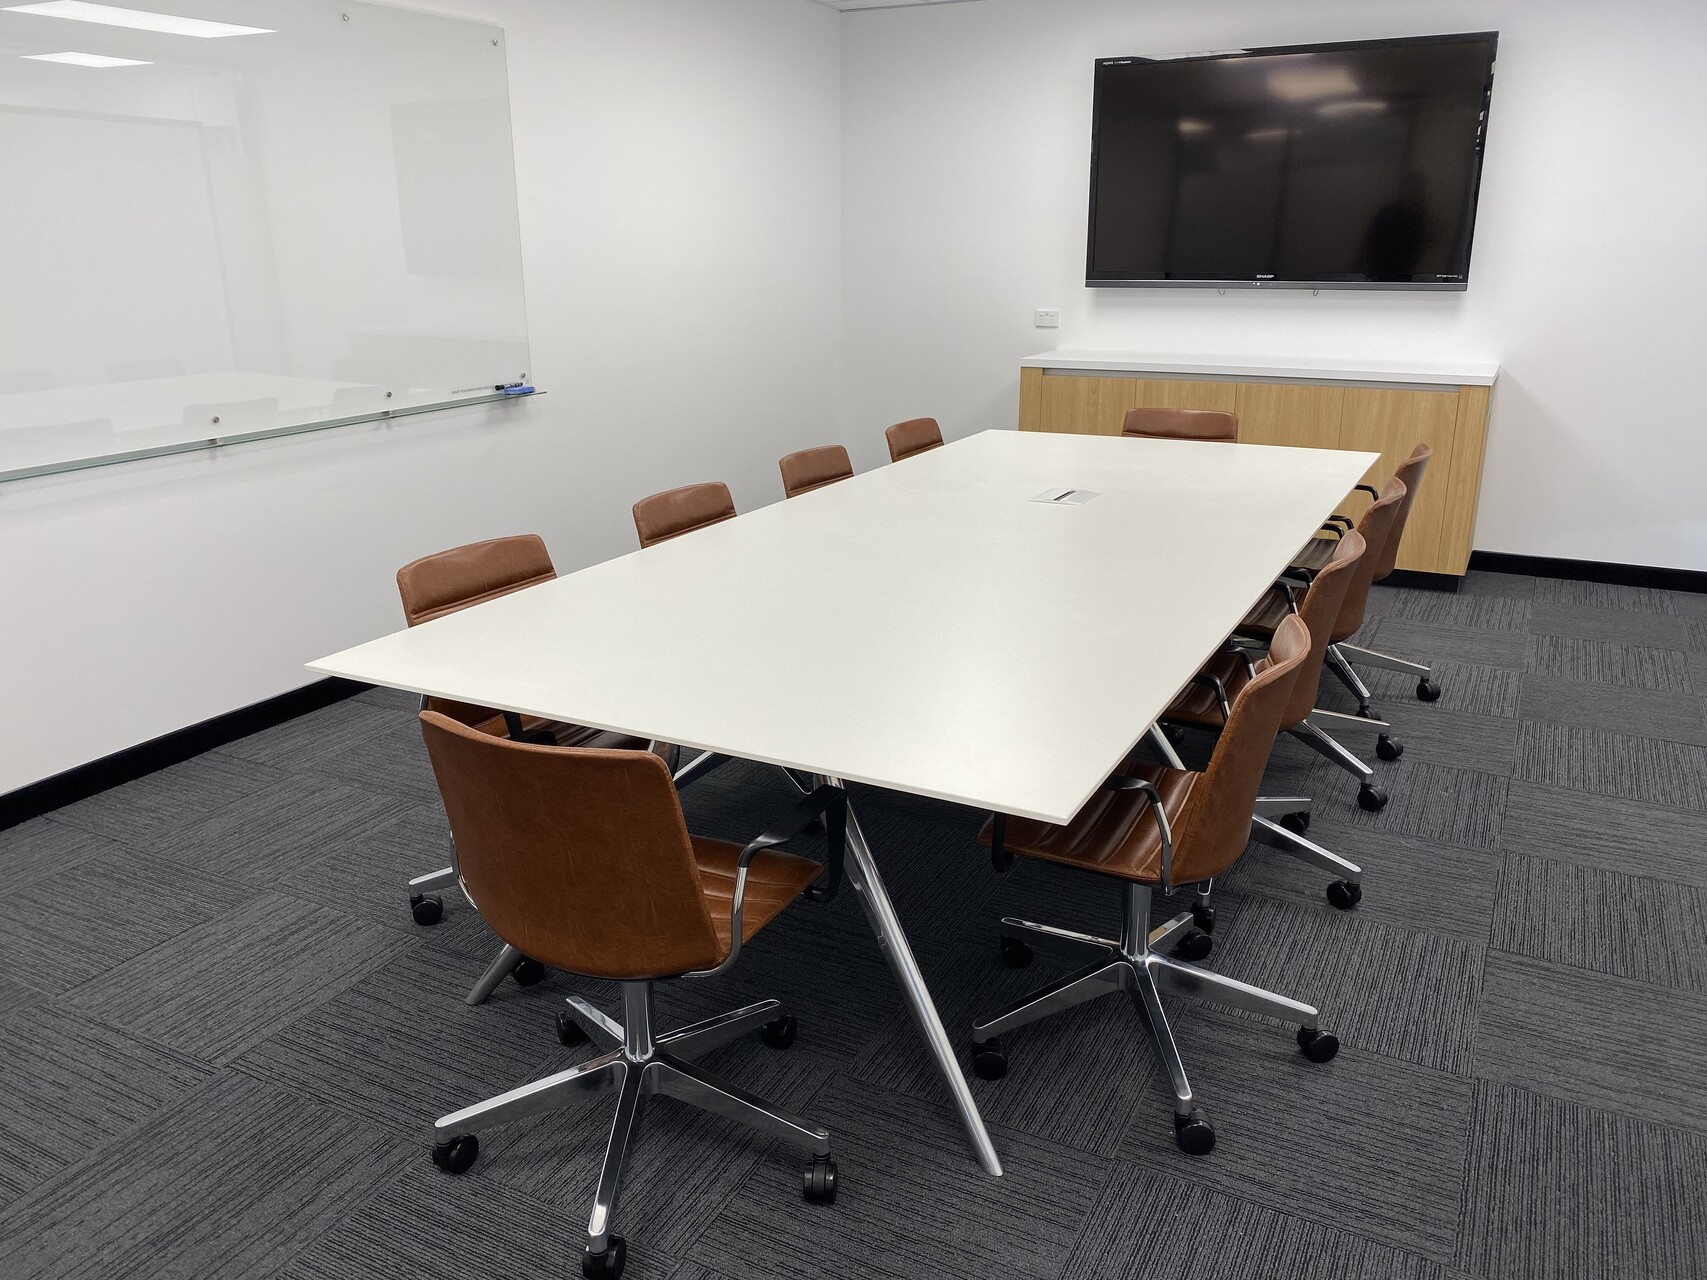 IMG_20191119_123251 conference table furniture darwin australia